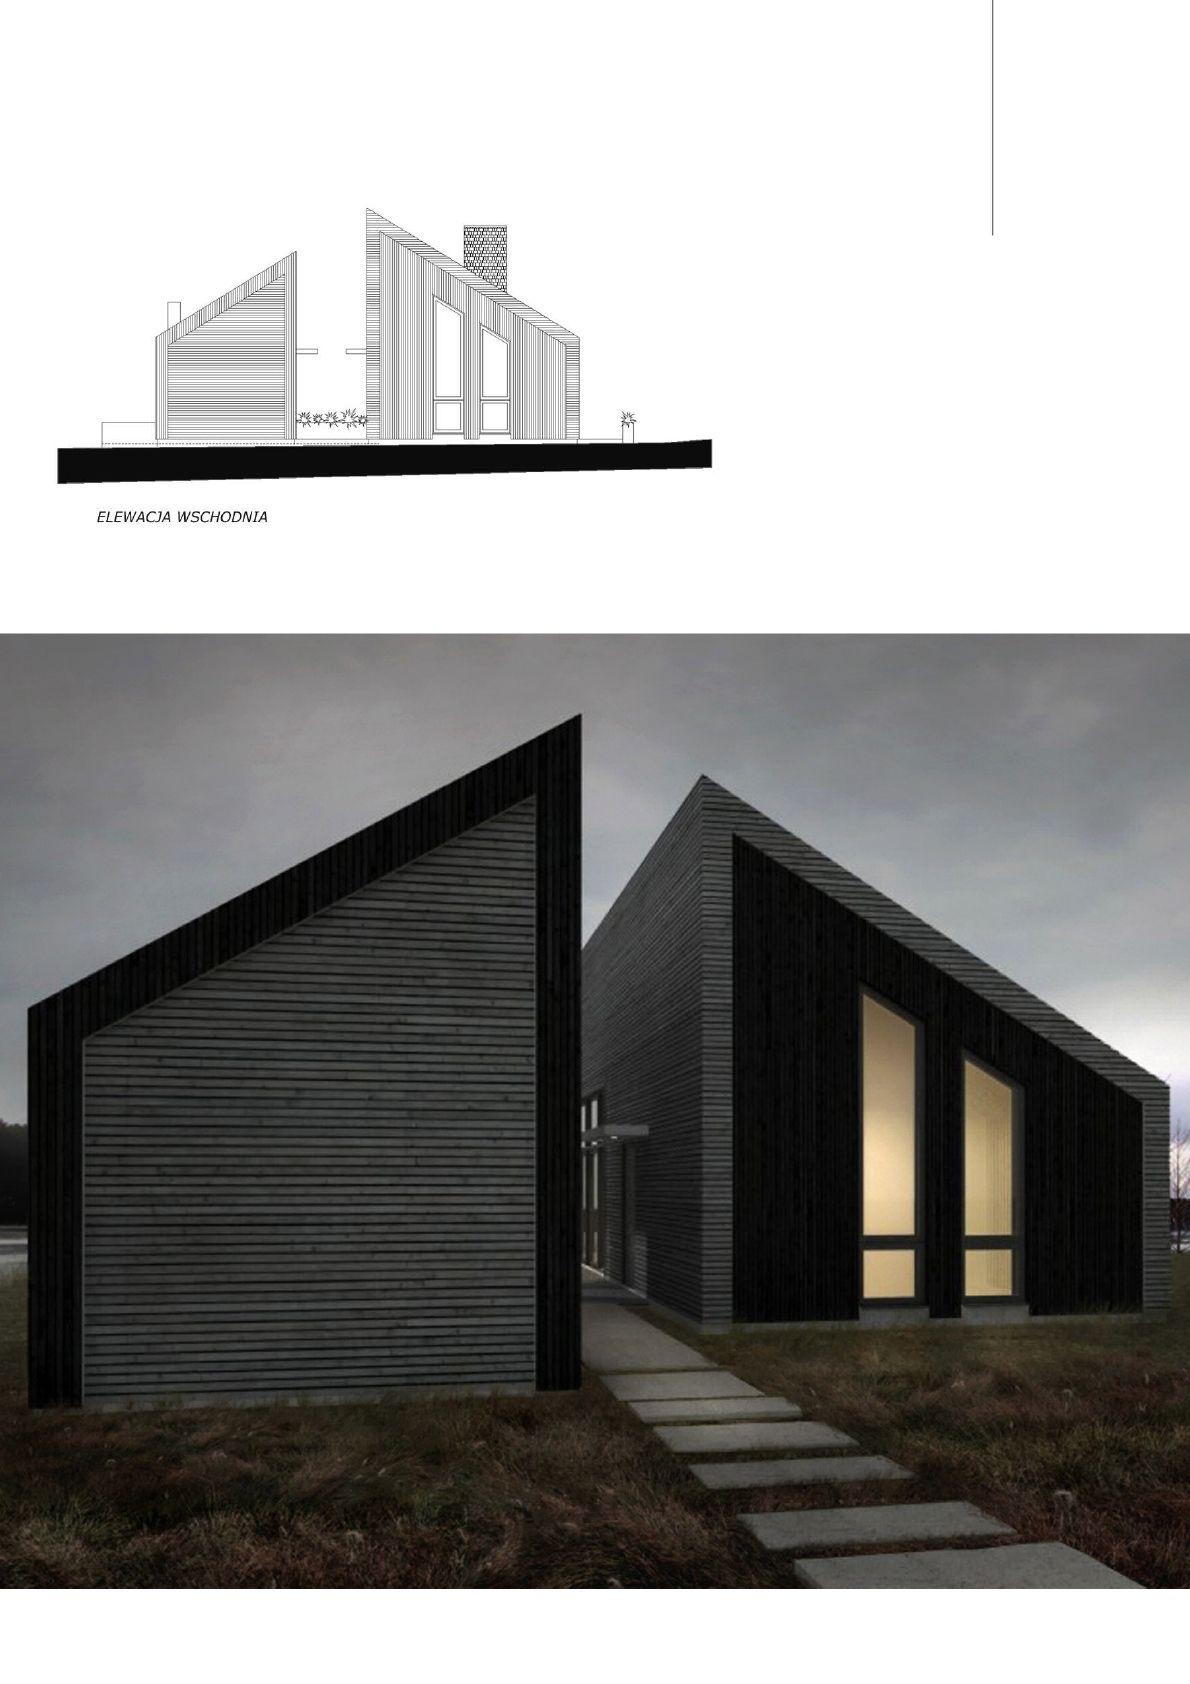 Minimalist House 85 Design: #luxury #luxuryhome #modernhome #moderndesign #design #modernarchitecture #architecture